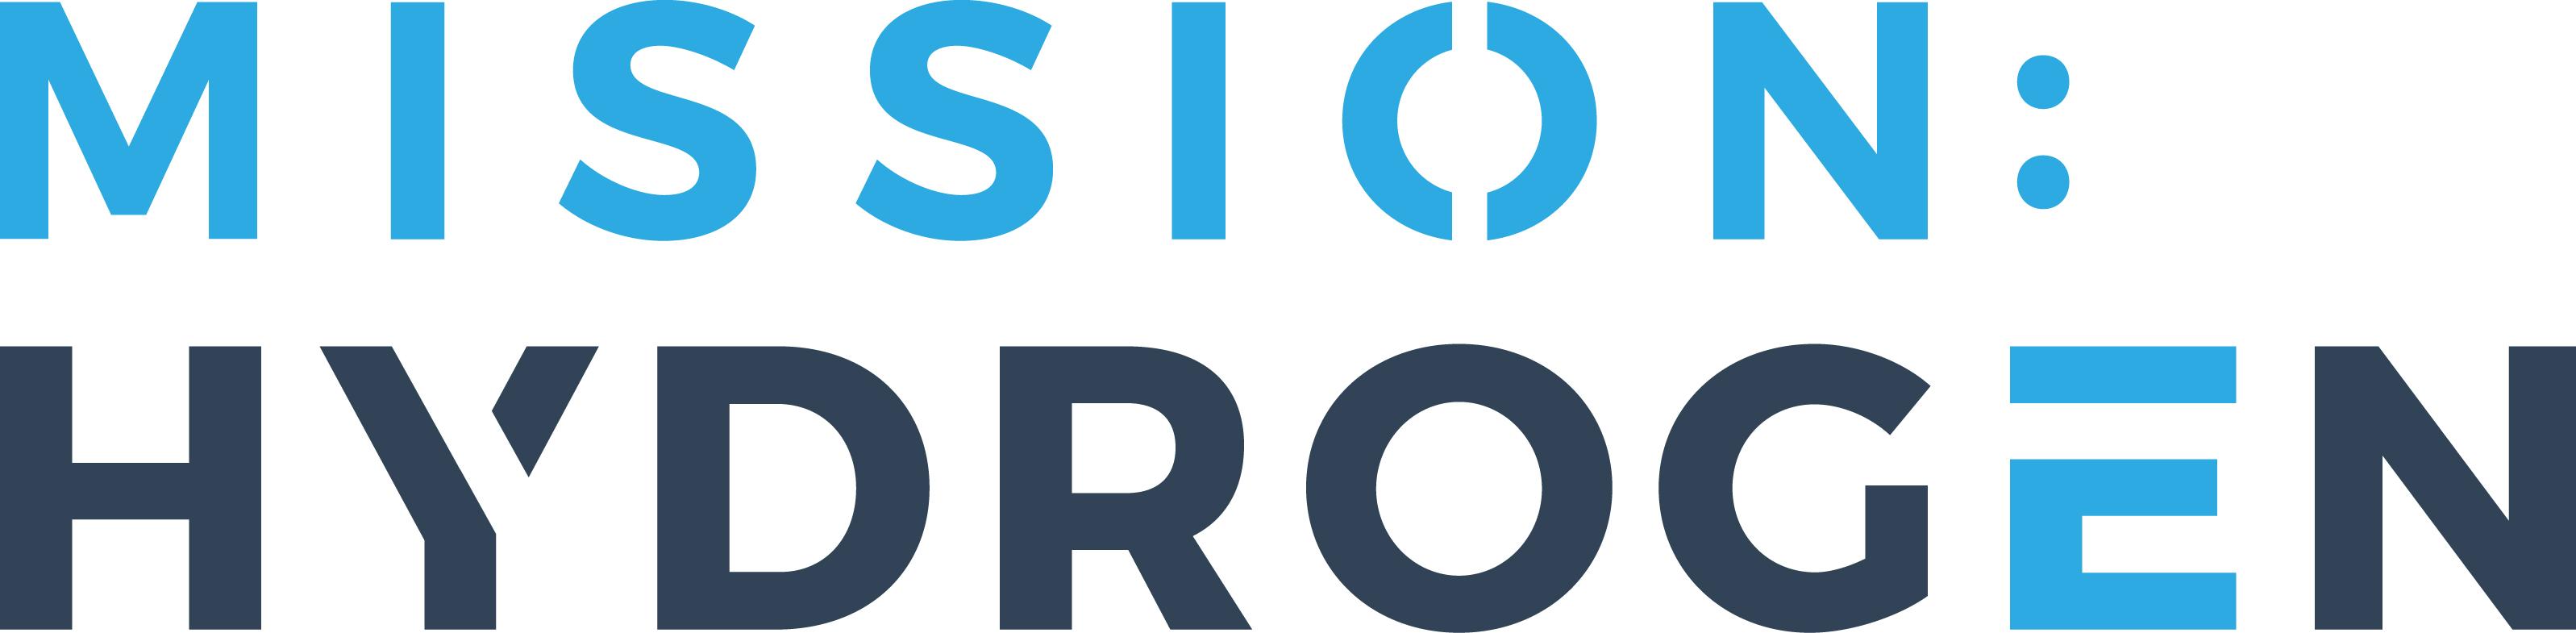 Mission Hydrogen_Logo.jpg